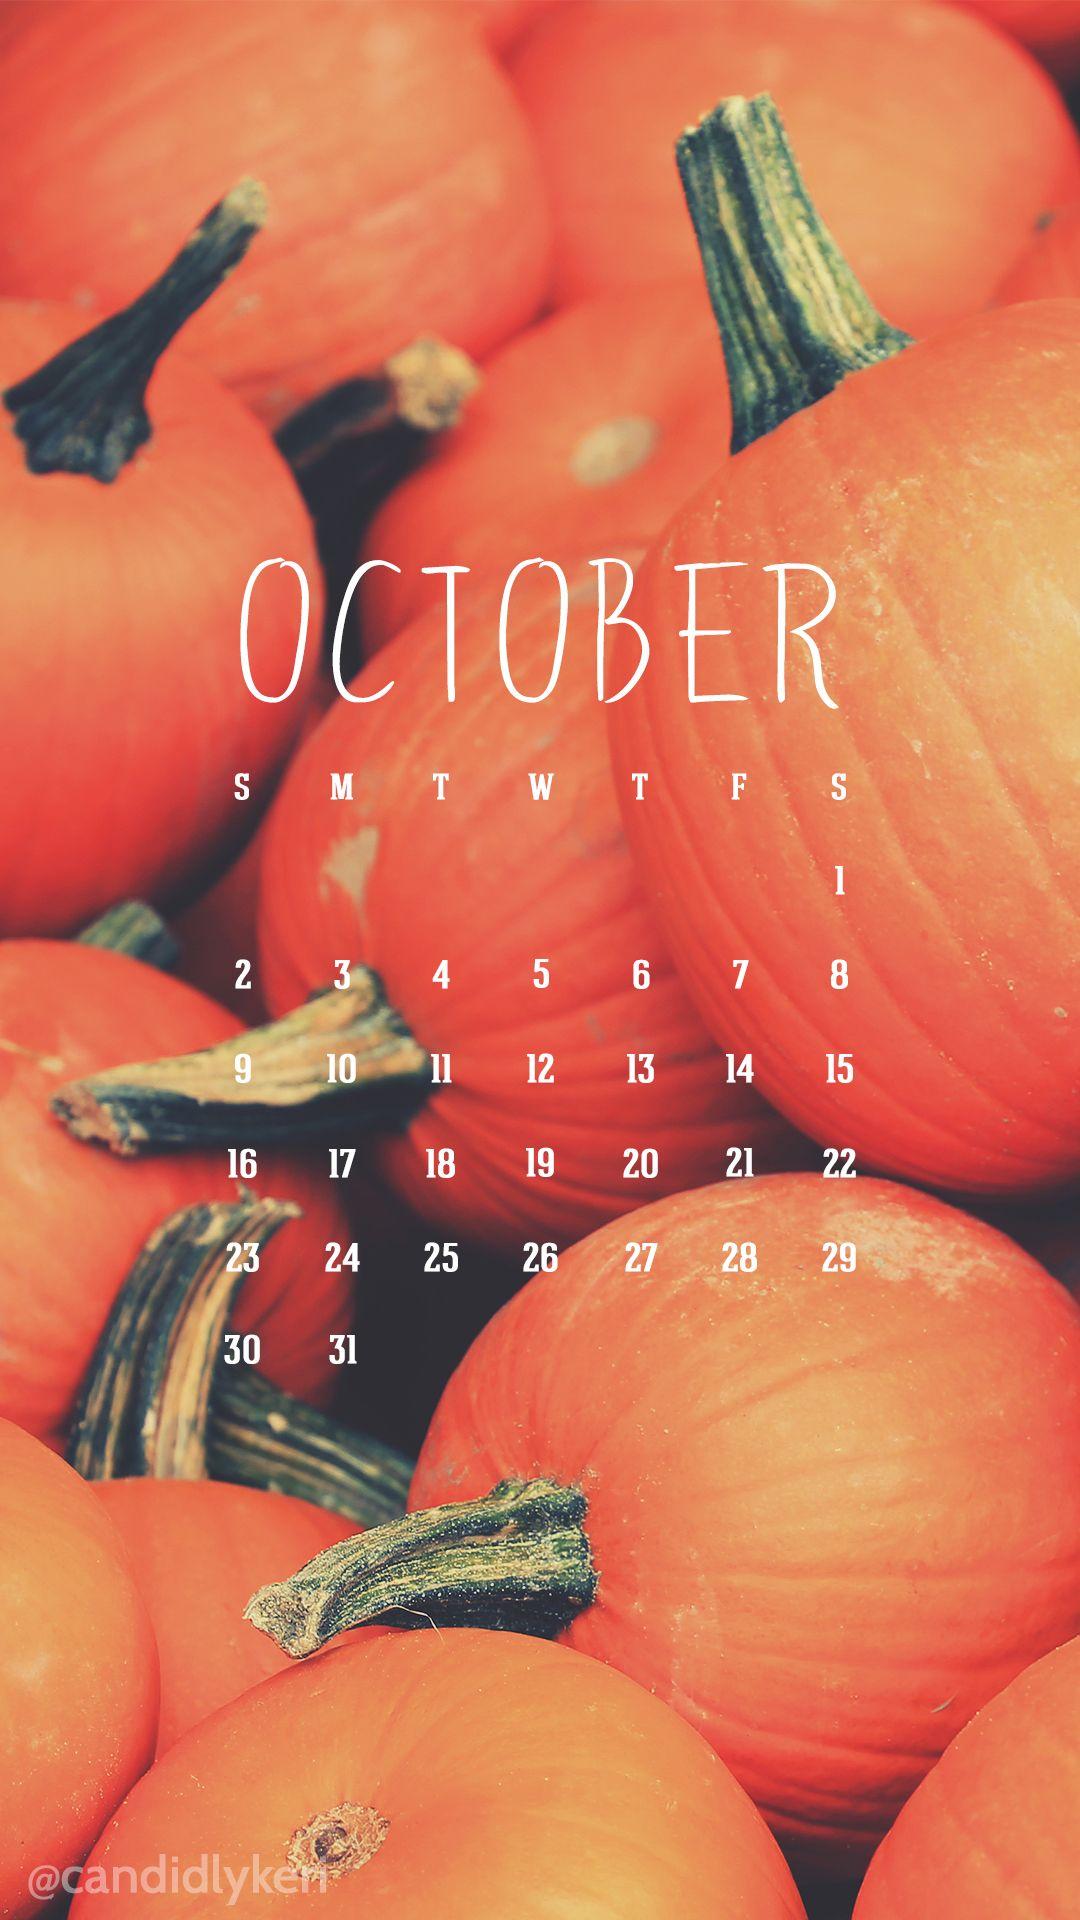 October Calendar Wallpaper Iphone : Cute pumpkin patch image october calendar wallpaper